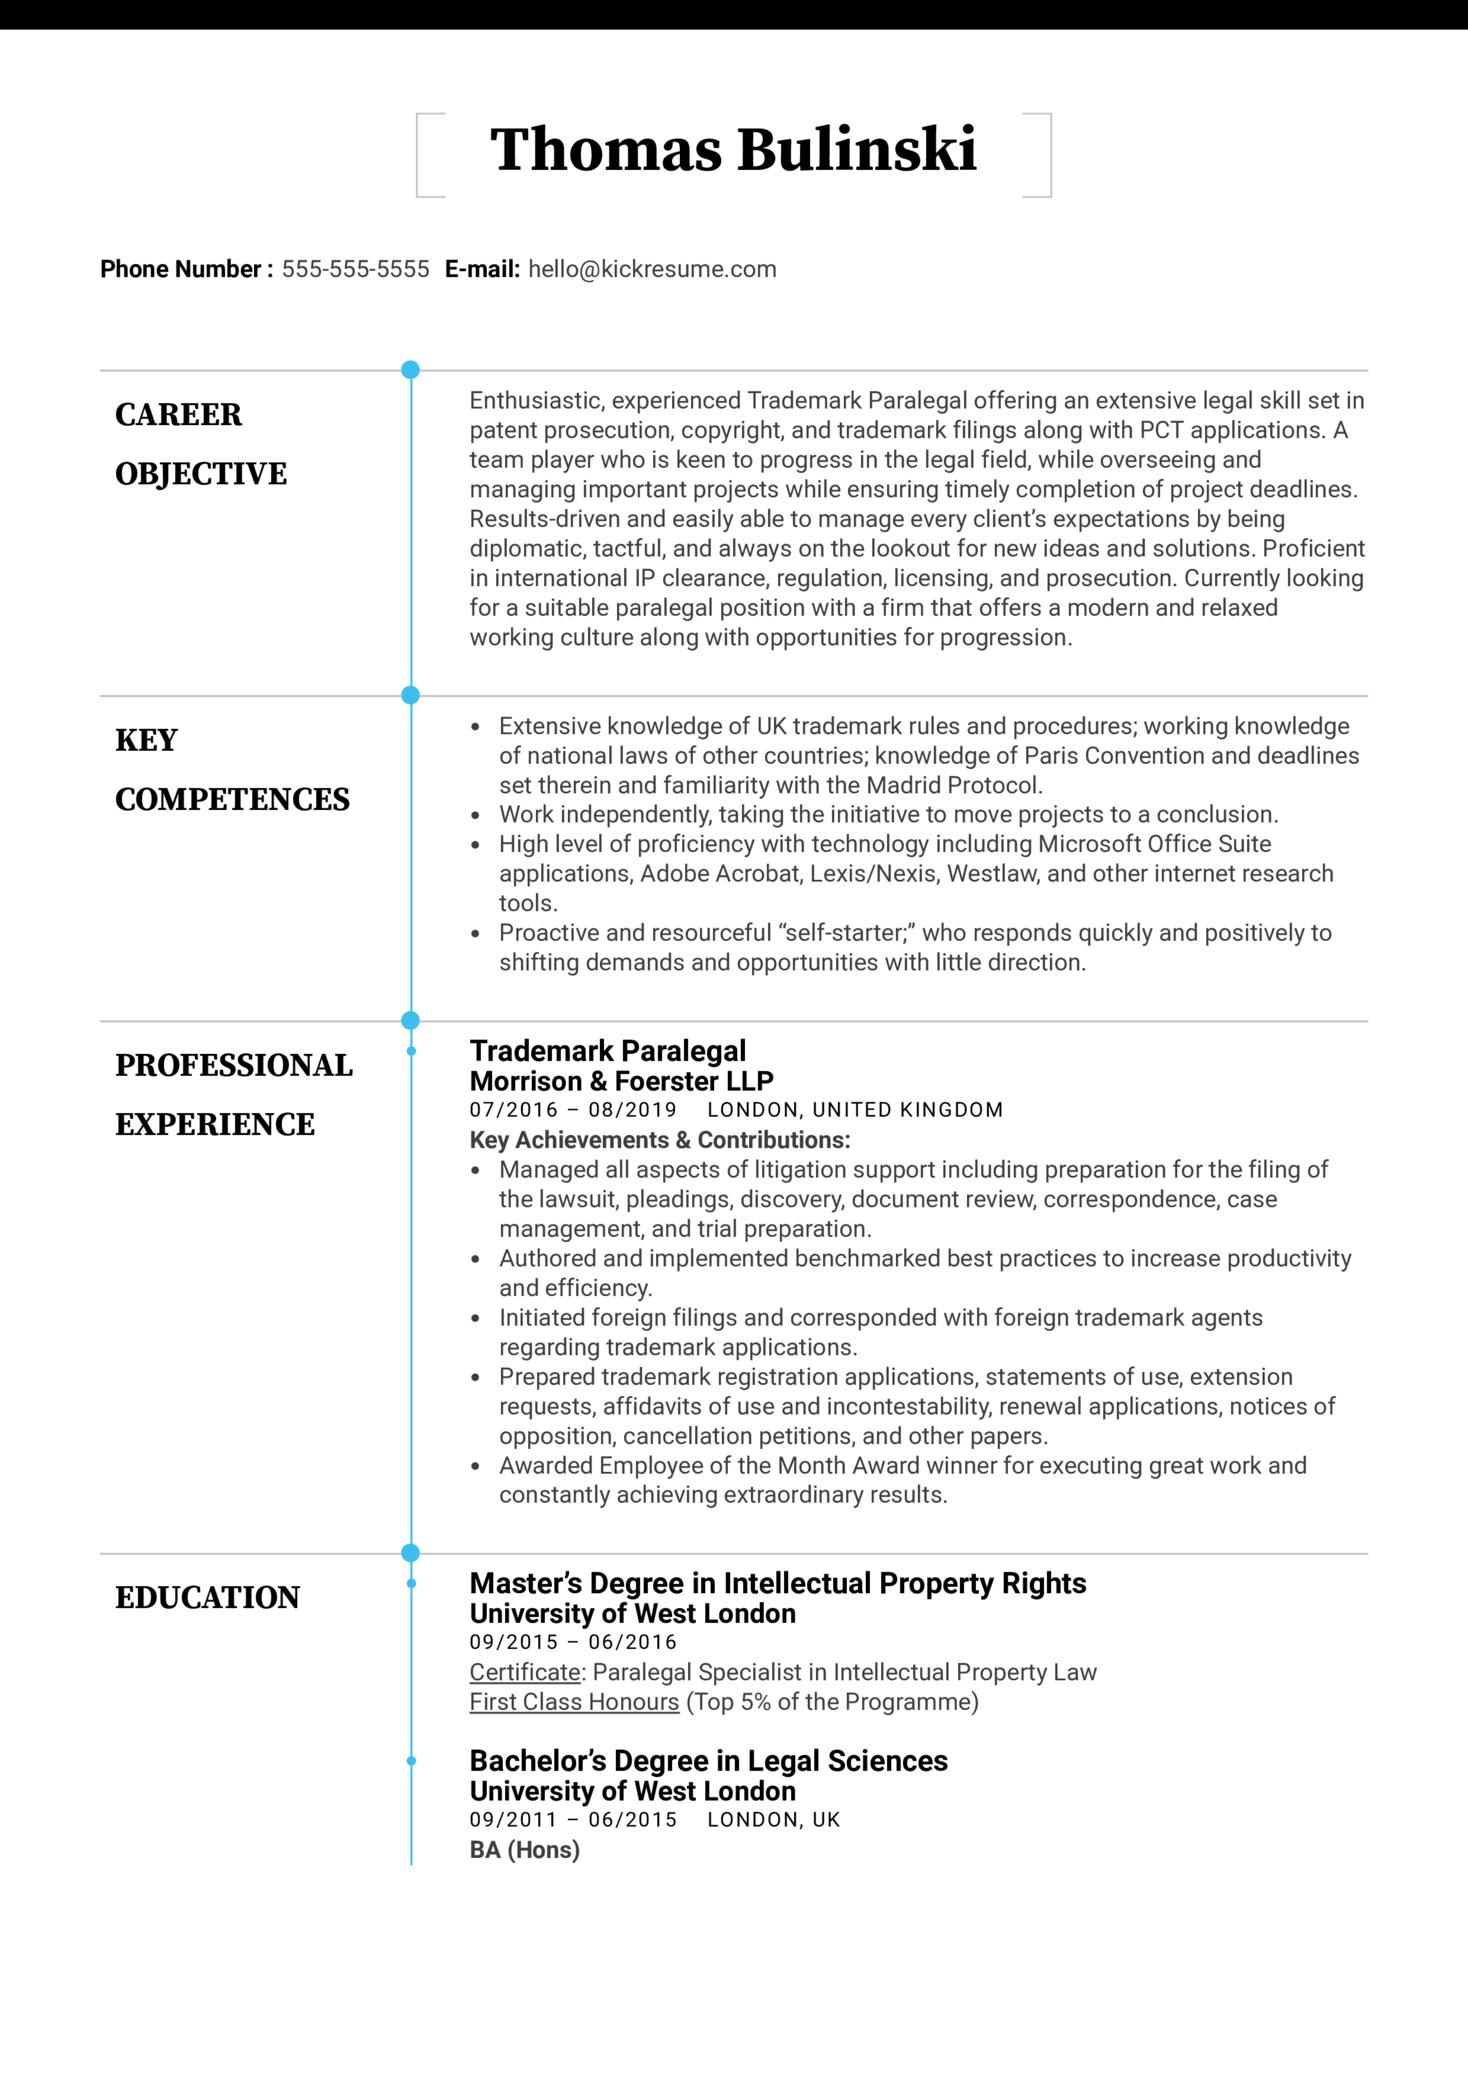 Trademark Paralegal Resume Sample (parte 1)